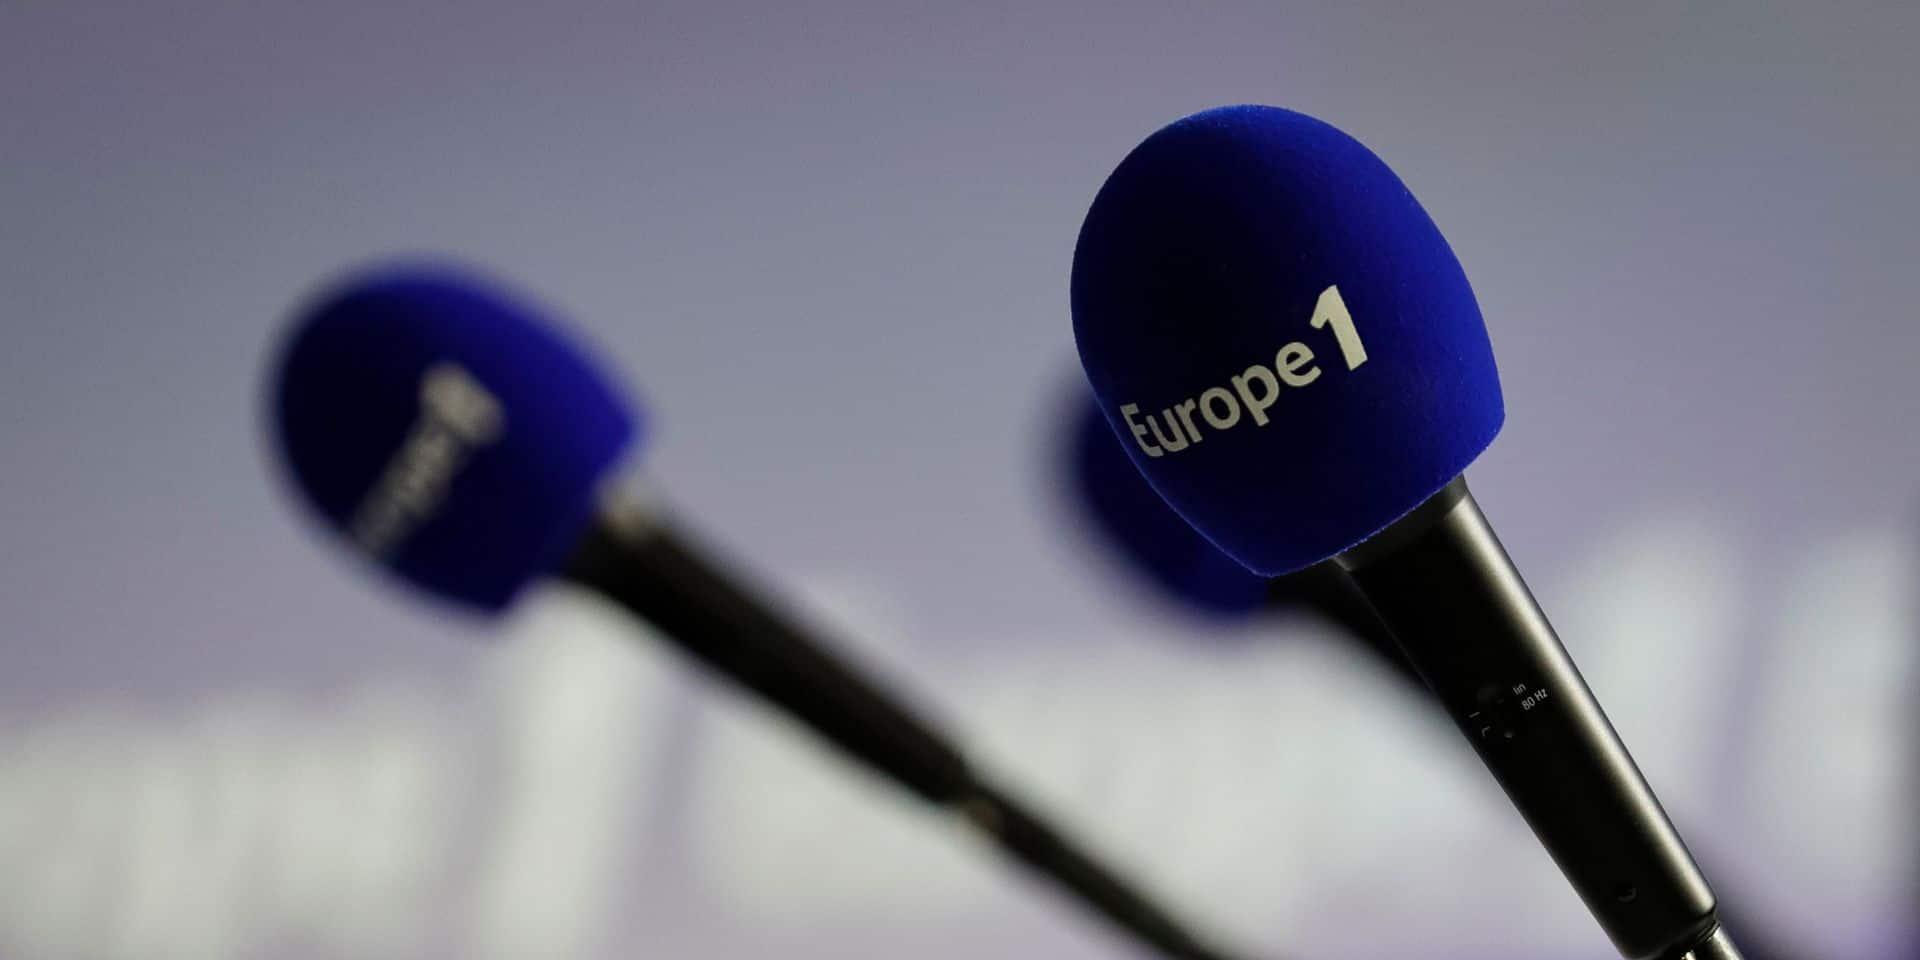 Masques obligatoires sur Europe 1 et France Inter. Quid des radios belges?